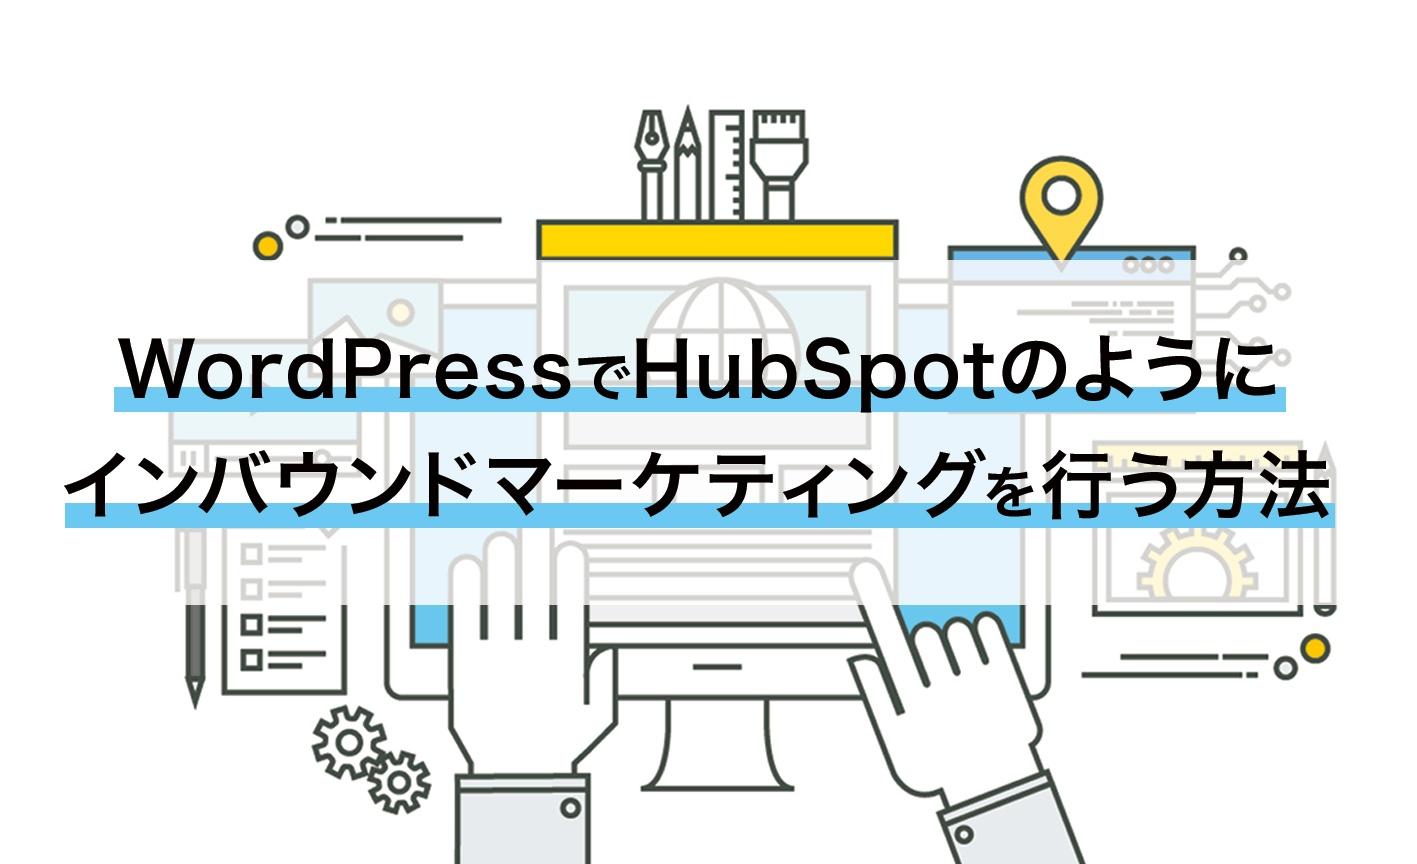 WordPressでHubSpotのようにインバウンドマーケティングを行う方法 イメージ画像